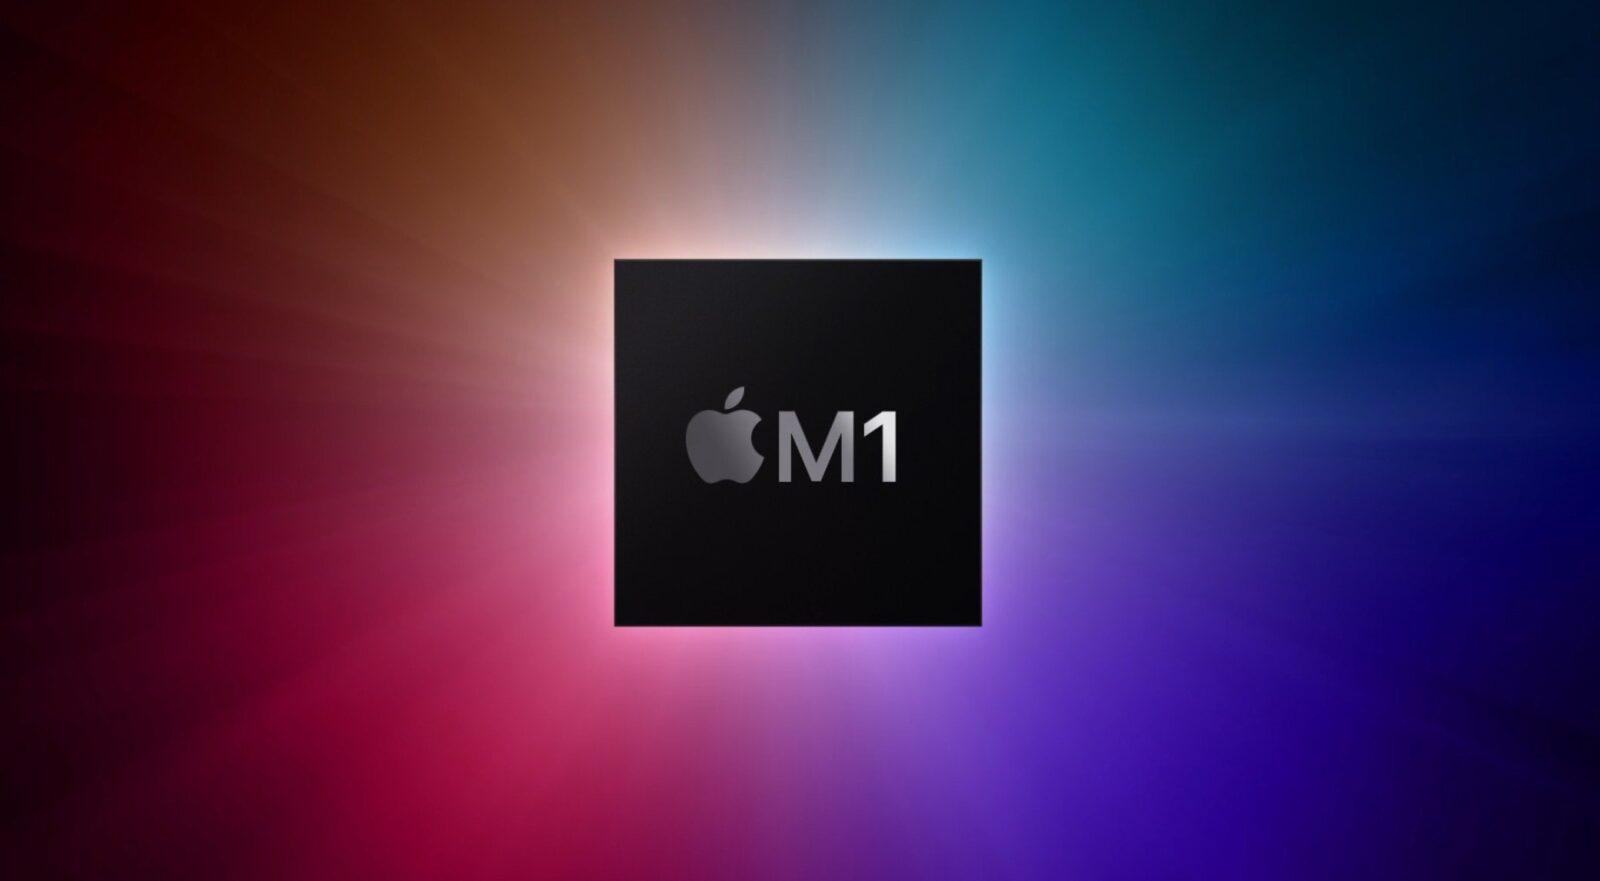 تراشه اختصاصی اپل M1